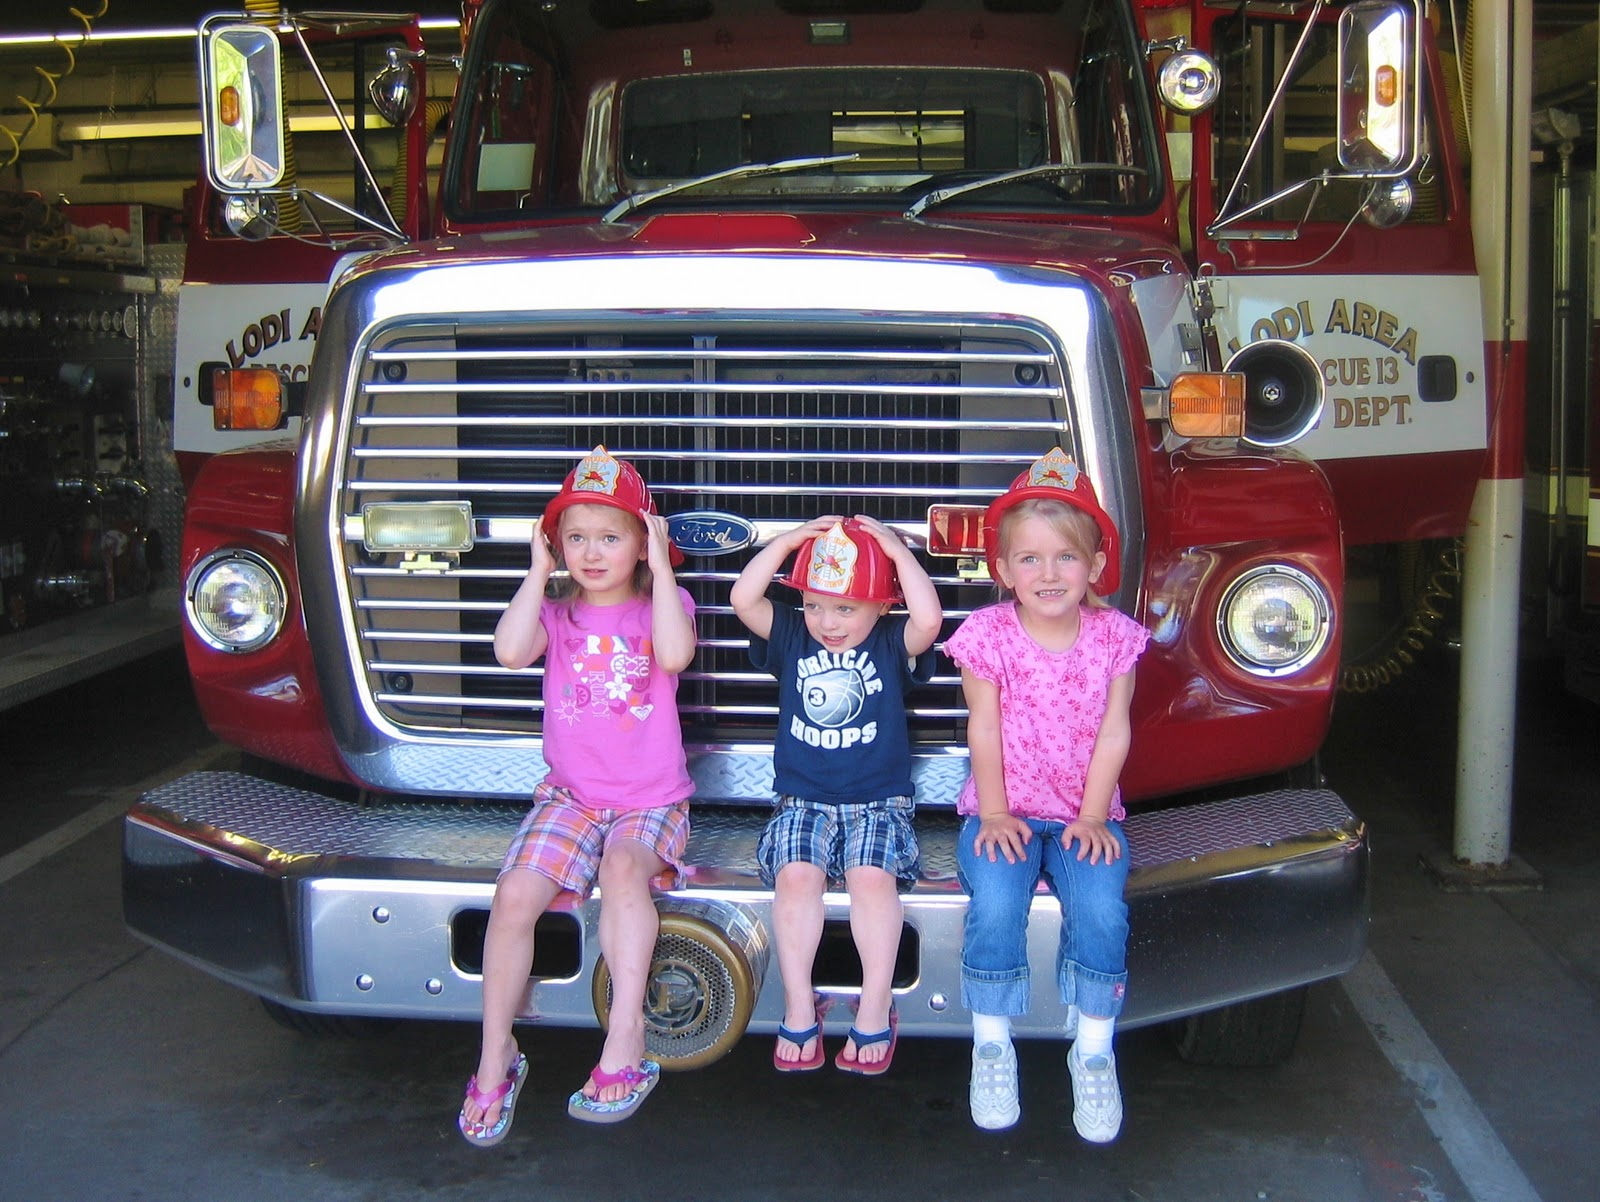 http://4.bp.blogspot.com/-f6ja3dejfZY/ToR67_zJA2I/AAAAAAAAAOA/h0d89r8NoCY/s1600/kids+on+firetruck.jpg